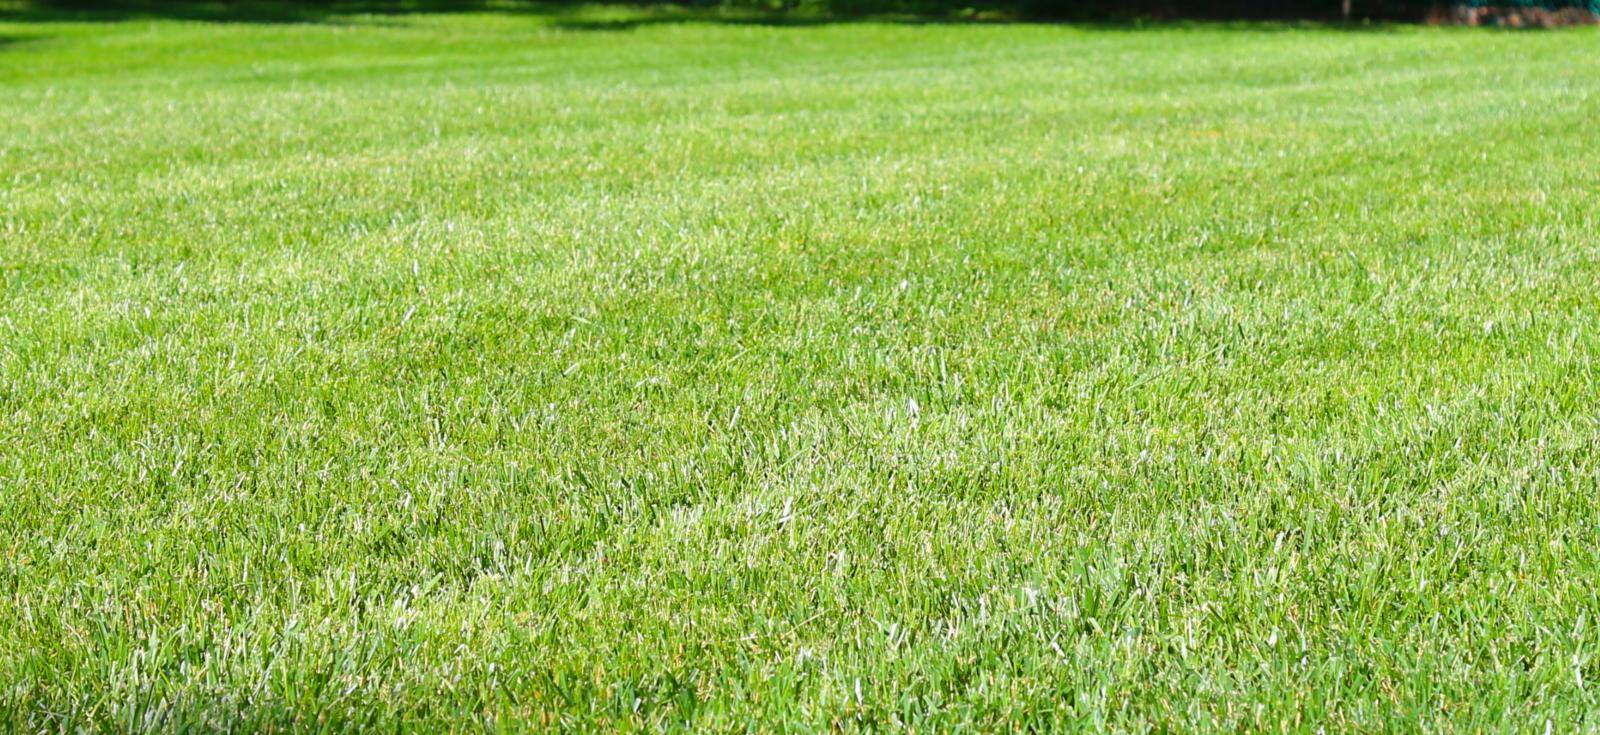 Lawn Mowers Parole Maryland